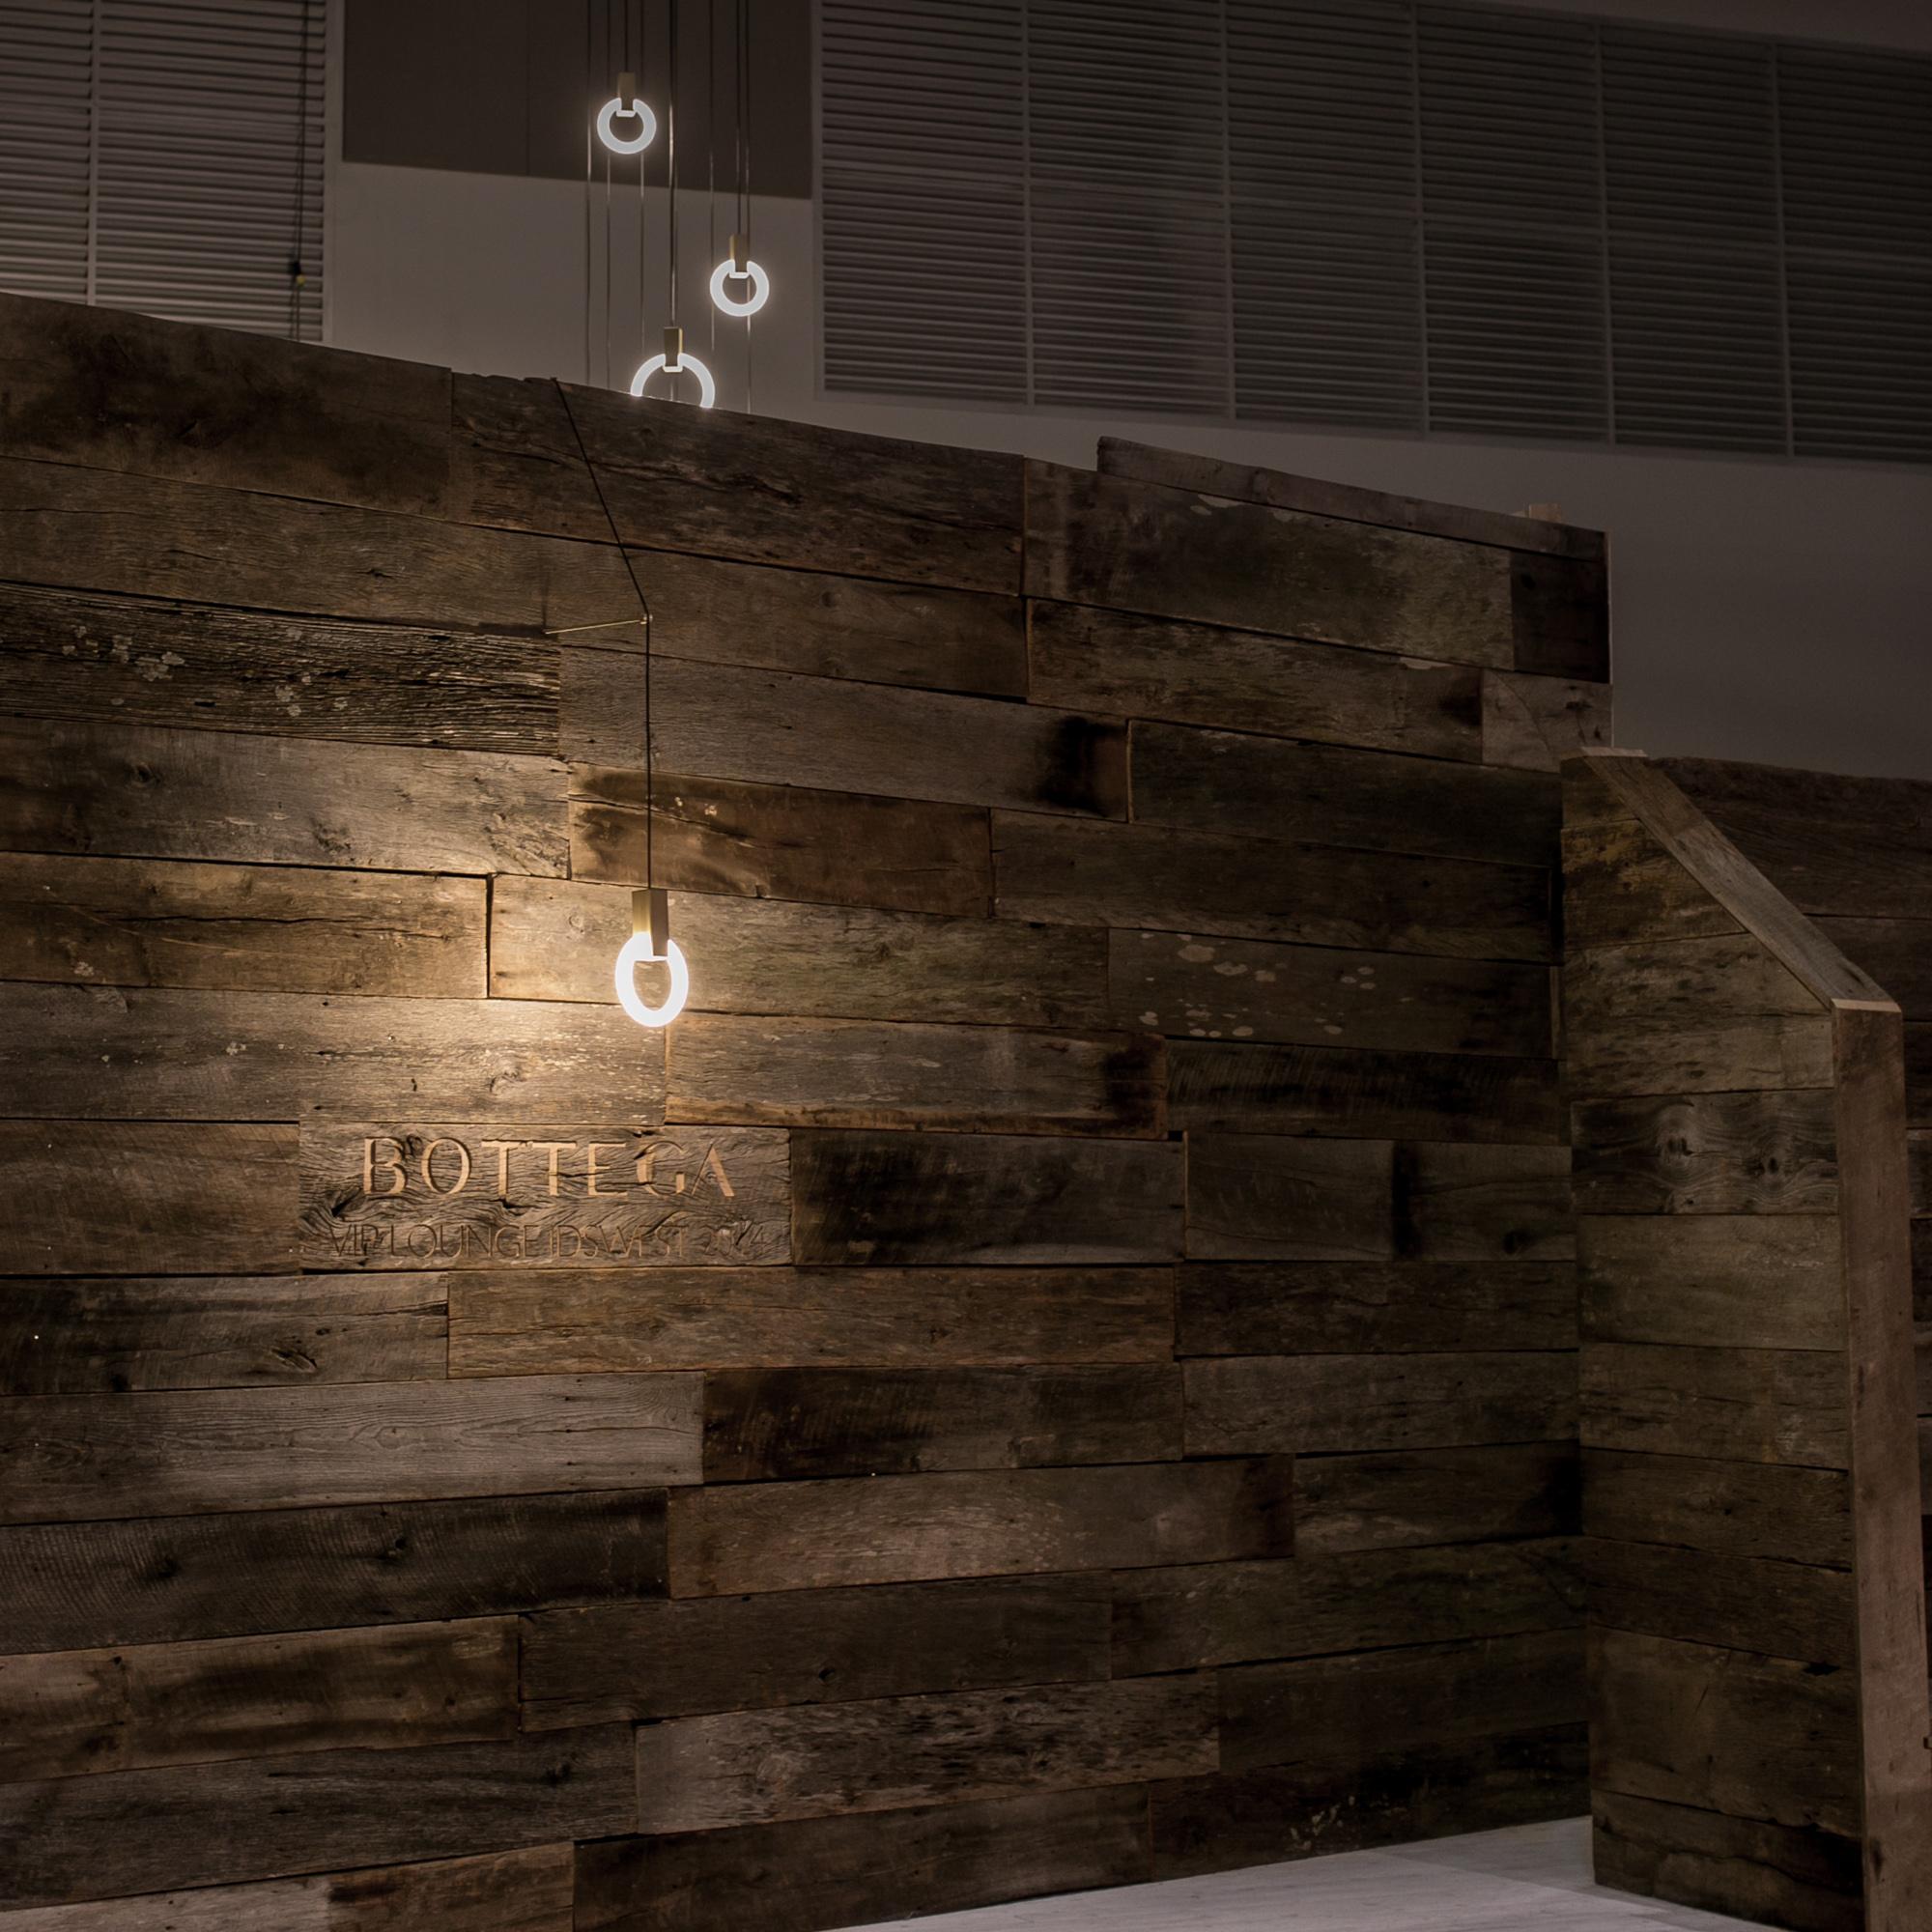 Bottega Vip Lounge-9.jpg